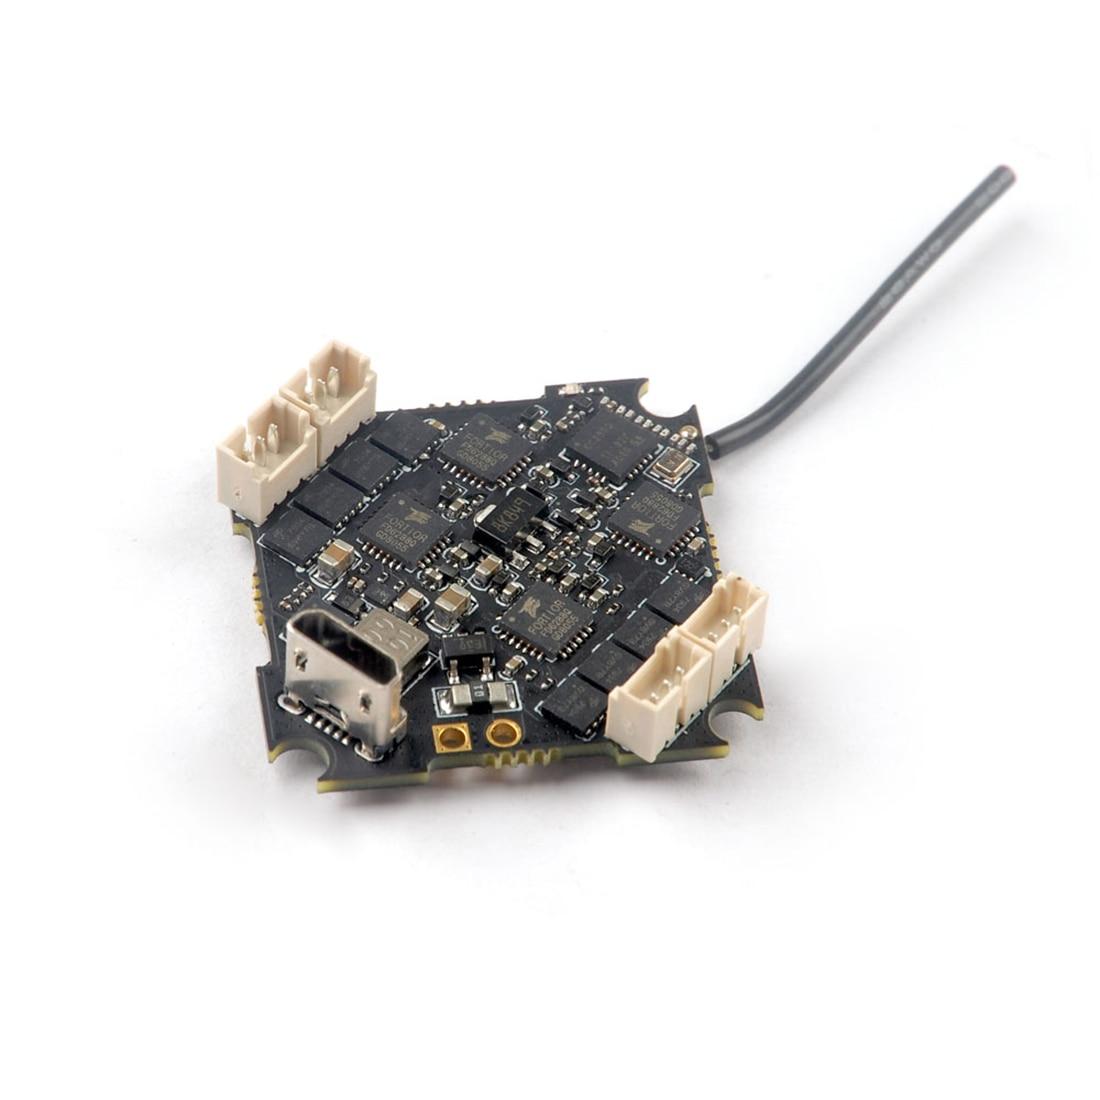 Happymodel F4 PRO V3.0 Flight Controller Blheli_S 10A 2 4S Brushless ESC สำหรับ Frsky Flysky สำหรับ Cinecan 4K Drone-ใน ชิ้นส่วนและอุปกรณ์เสริม จาก ของเล่นและงานอดิเรก บน AliExpress - 11.11_สิบเอ็ด สิบเอ็ดวันคนโสด 1